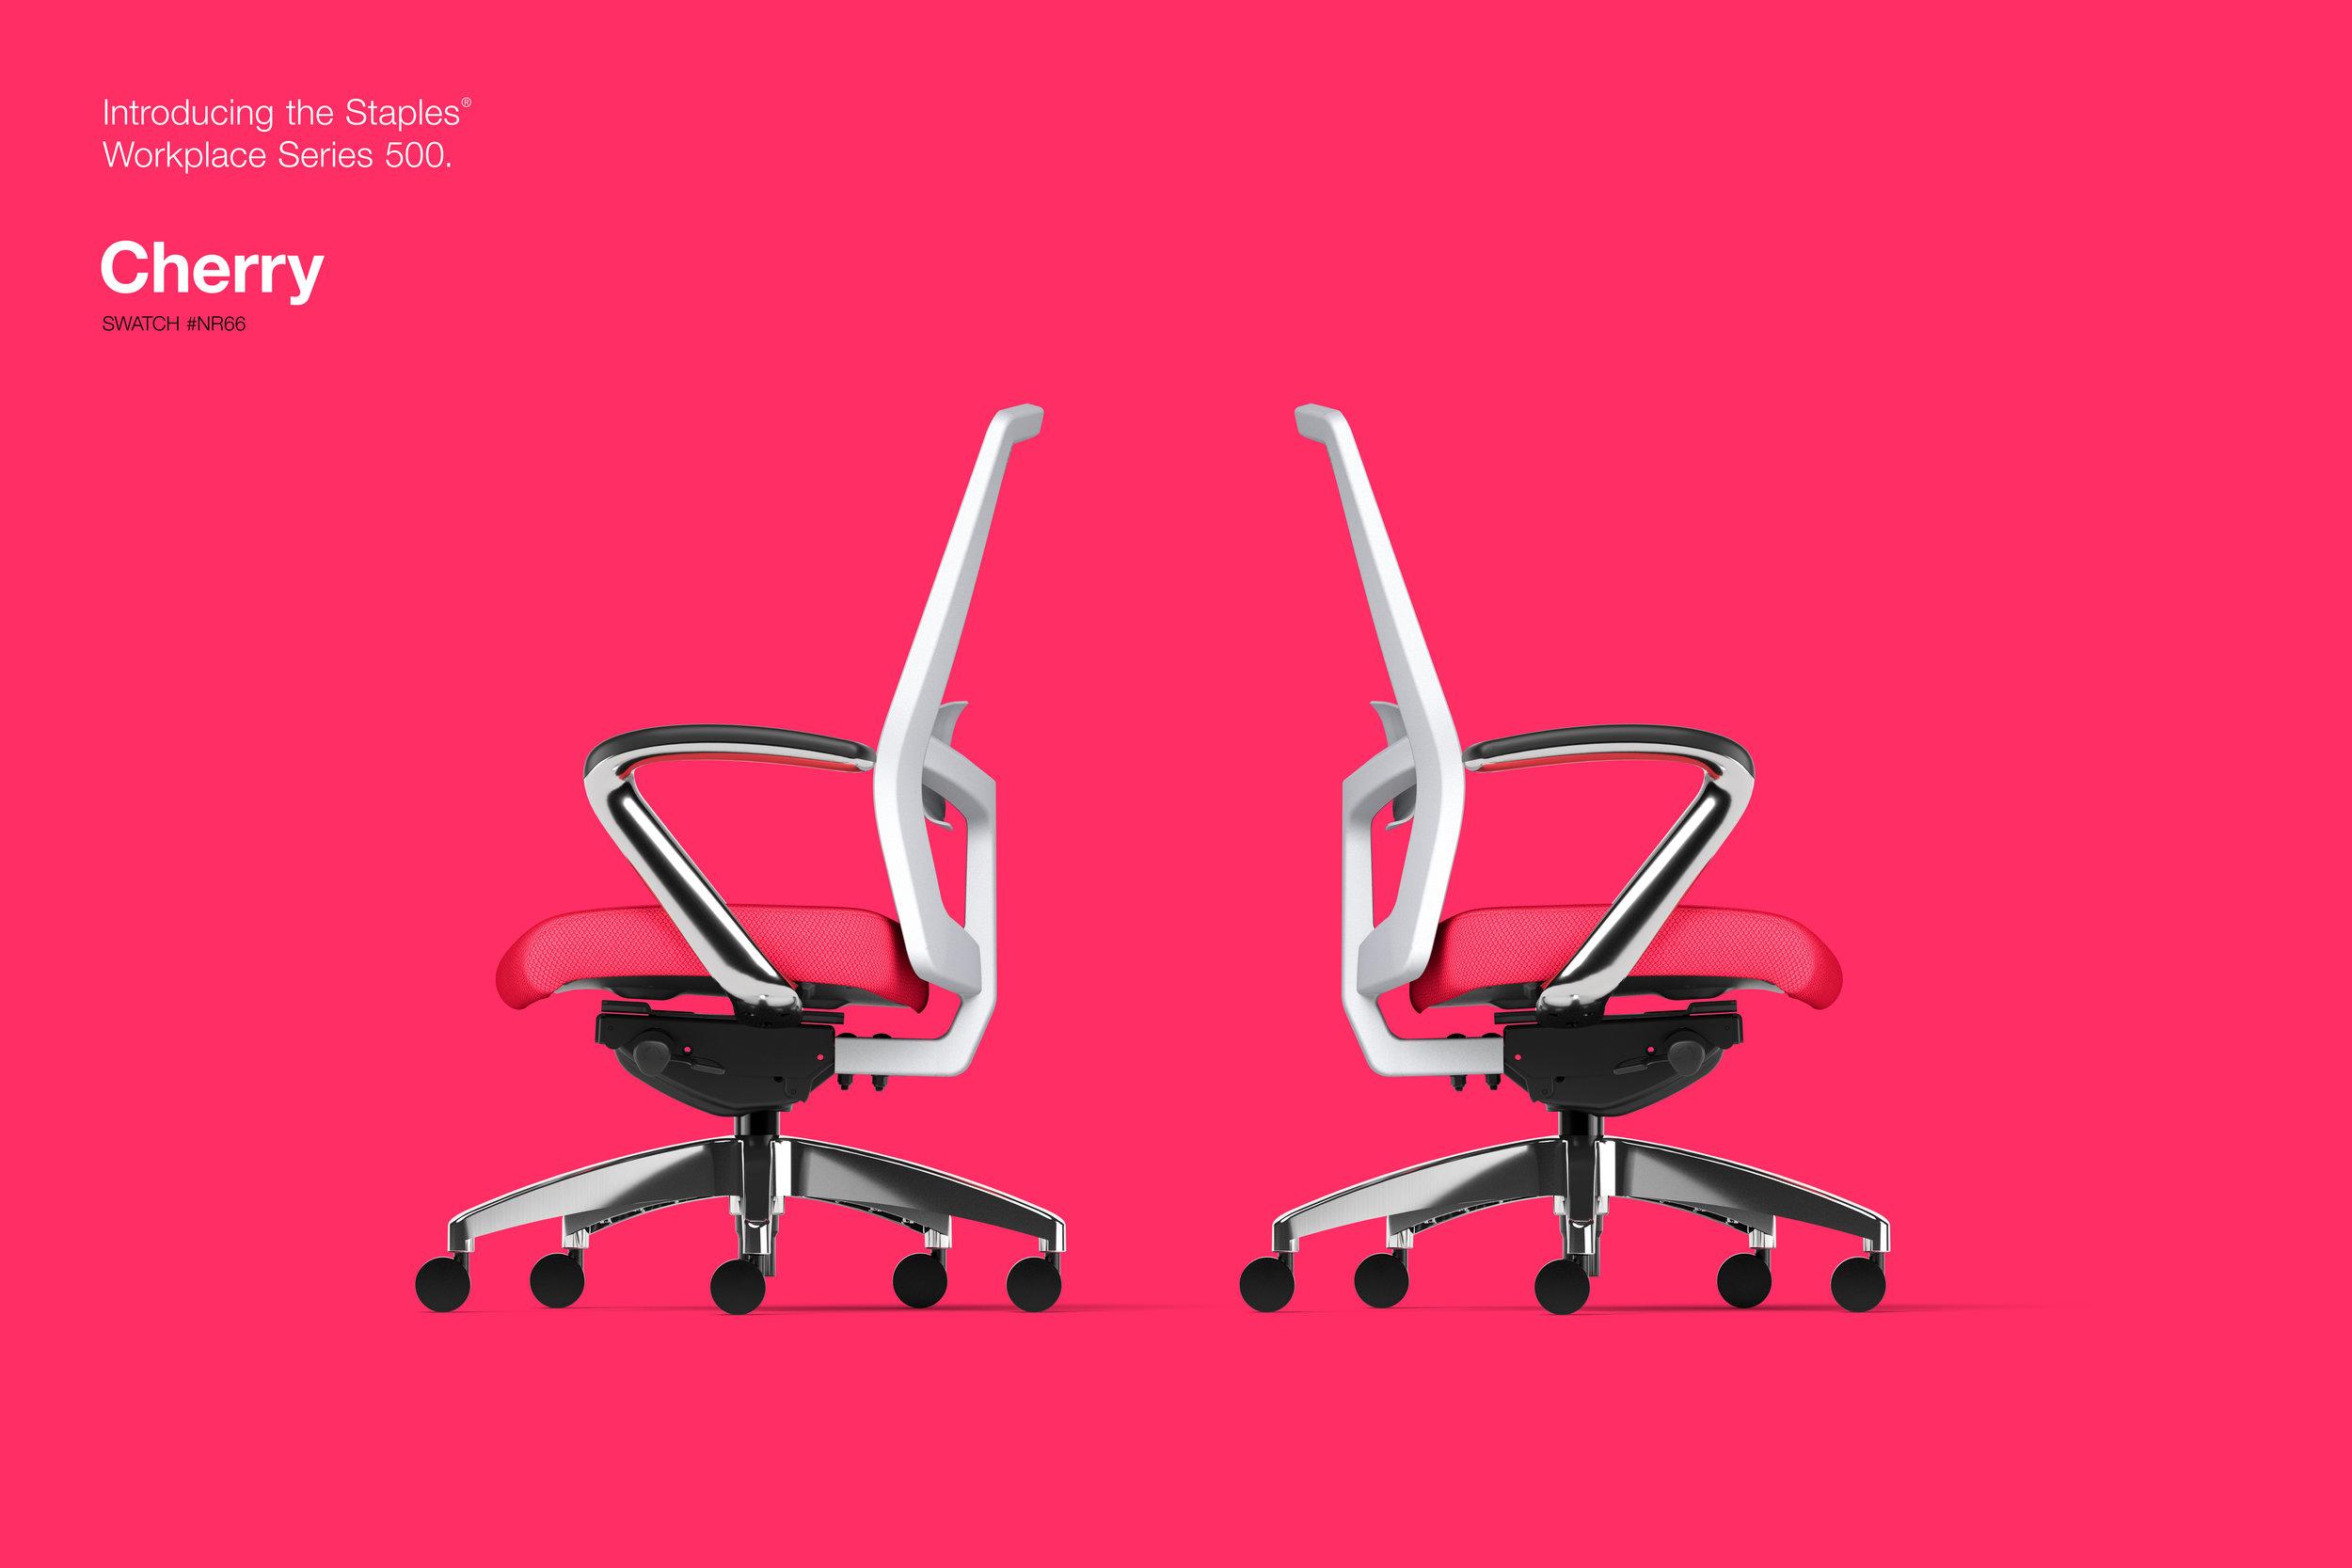 01_Staples-Workplace-Series-Task-Chair-Cherry.jpg